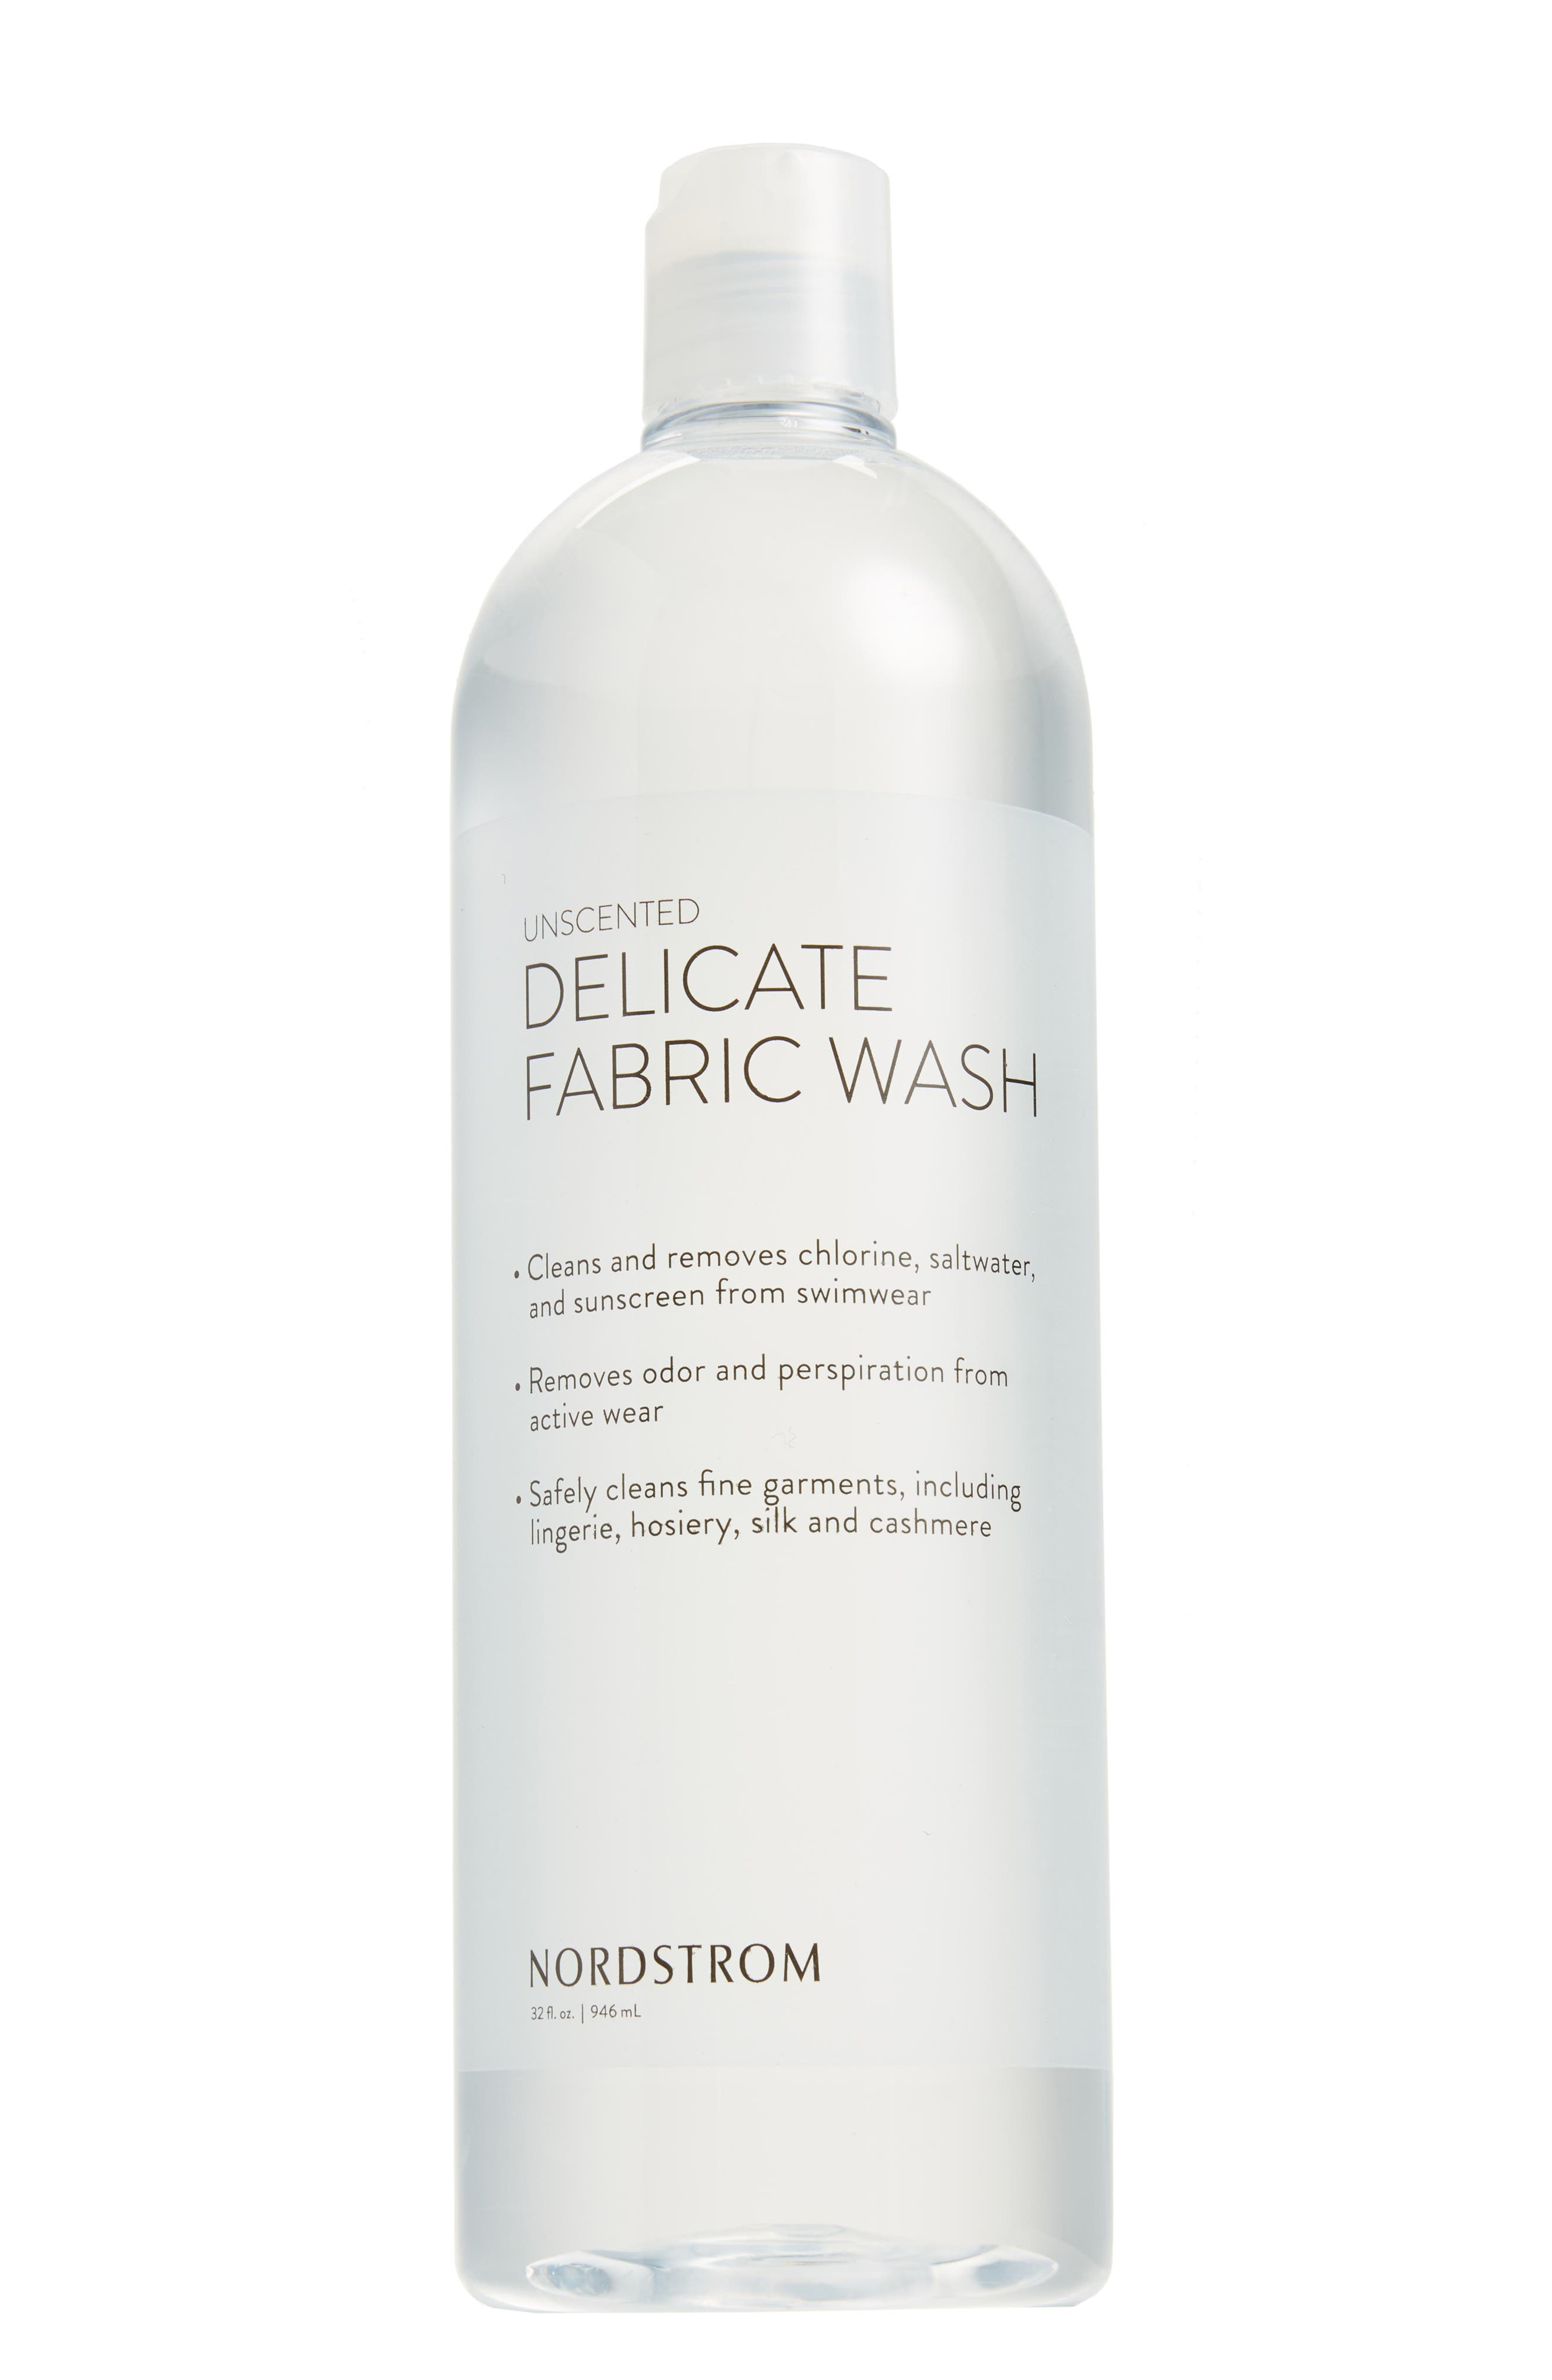 Nordstrom 32 oz. Fragrance Free Fabric Wash